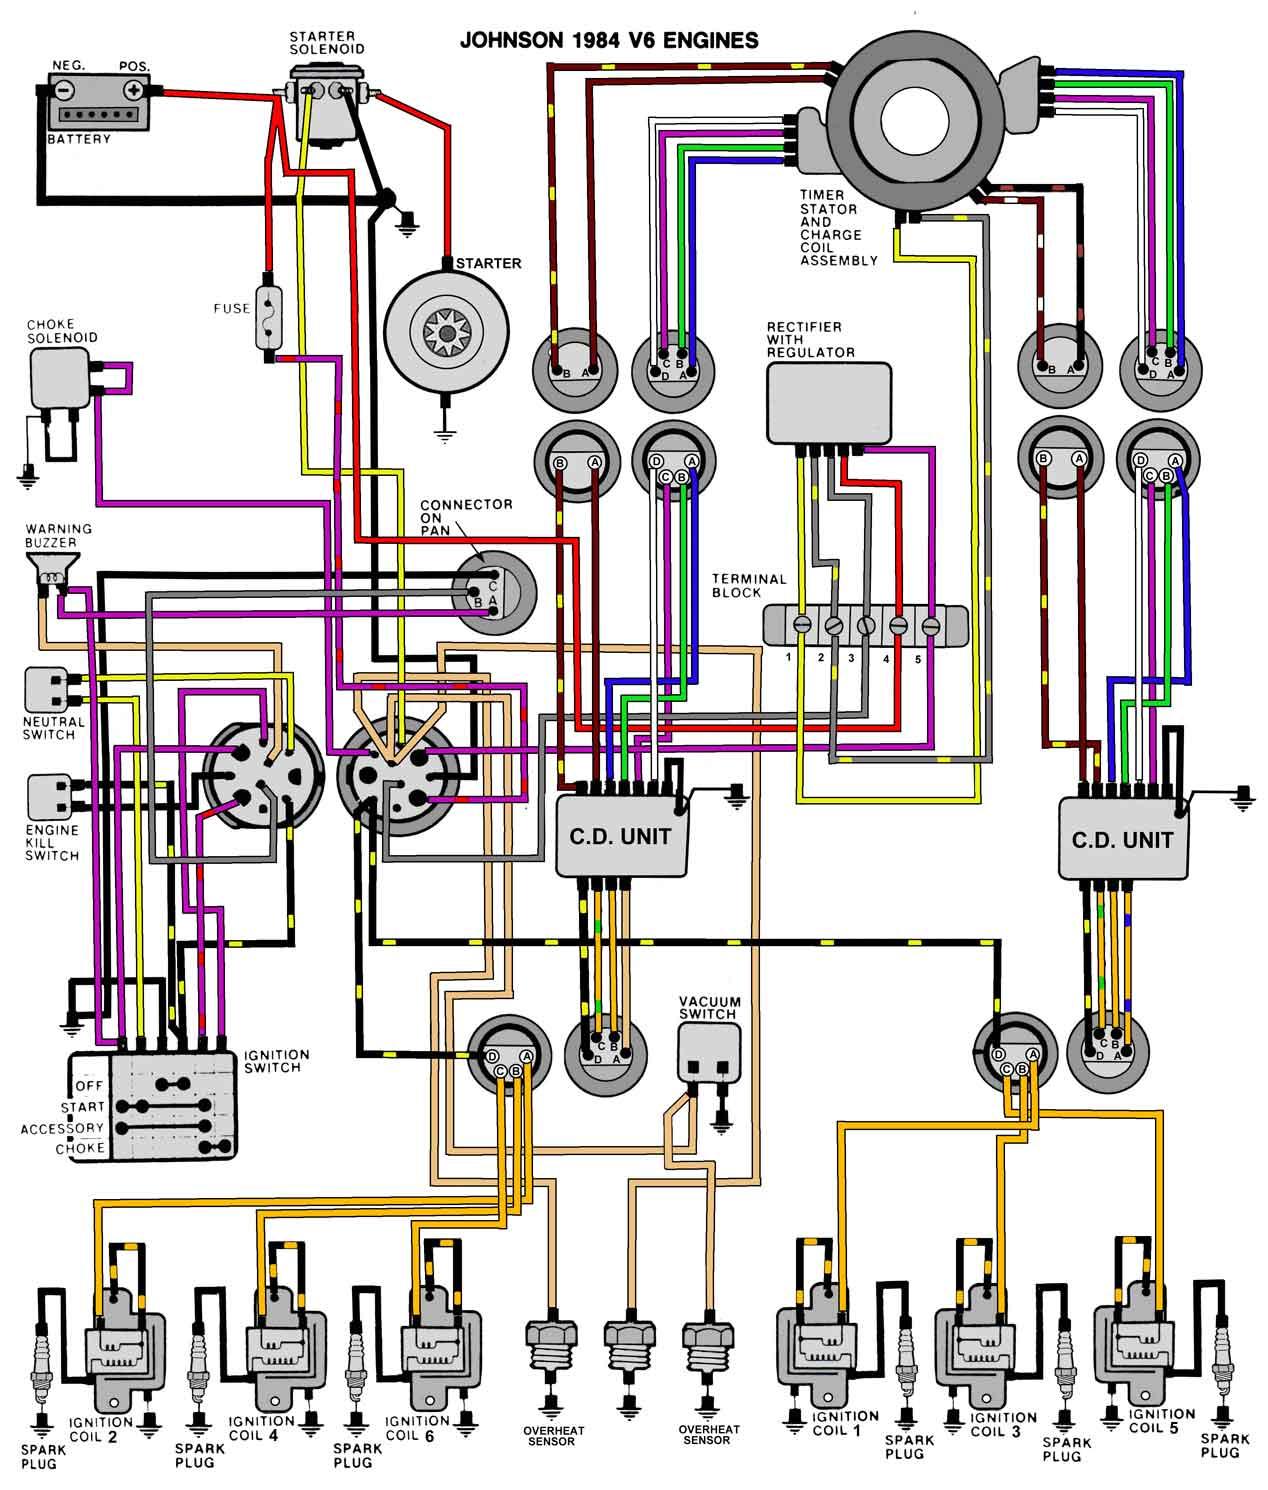 WRG-4948] Wiring Diagram 1996 Evinrude 225 on johnson outboard kill switch repair, 35 hp evinrude wiring diagram, johnson outboard ignition switch wiring,